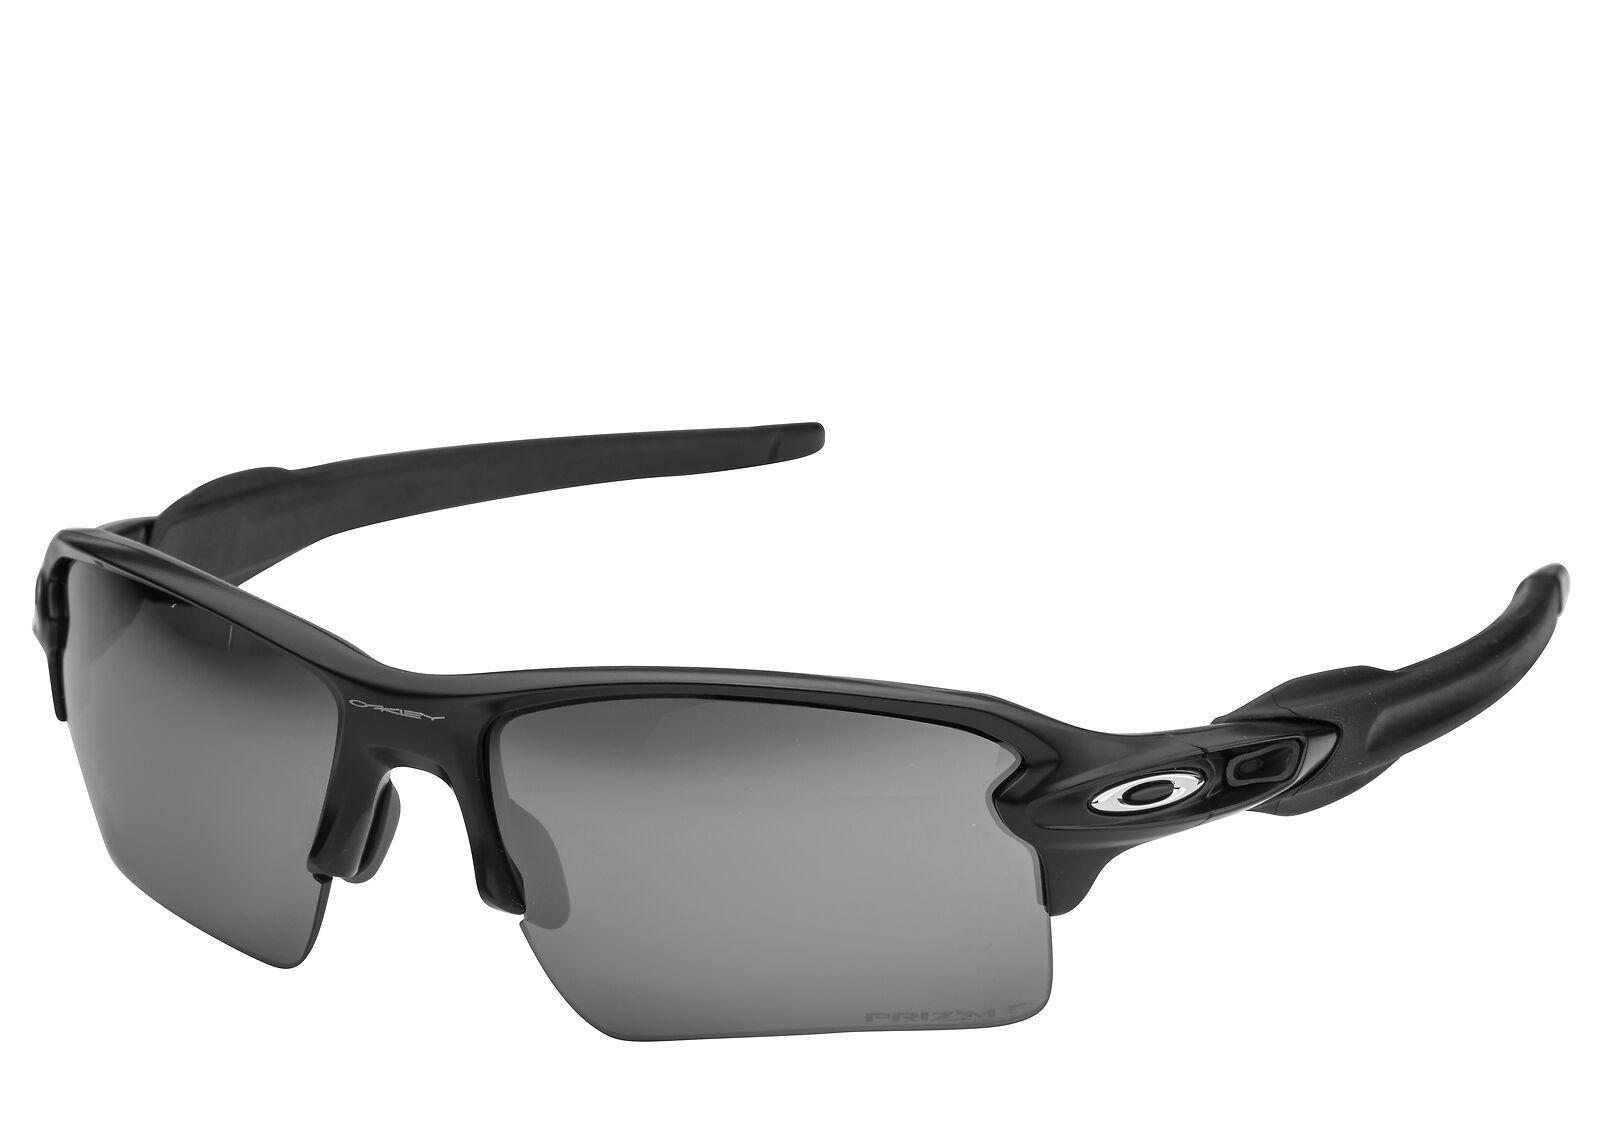 Oakley FLAK 2.0 XL POLARIZED Sunglasses 9188-96 Matte Black Prizm Lens  OO9188-96 afb0de413b